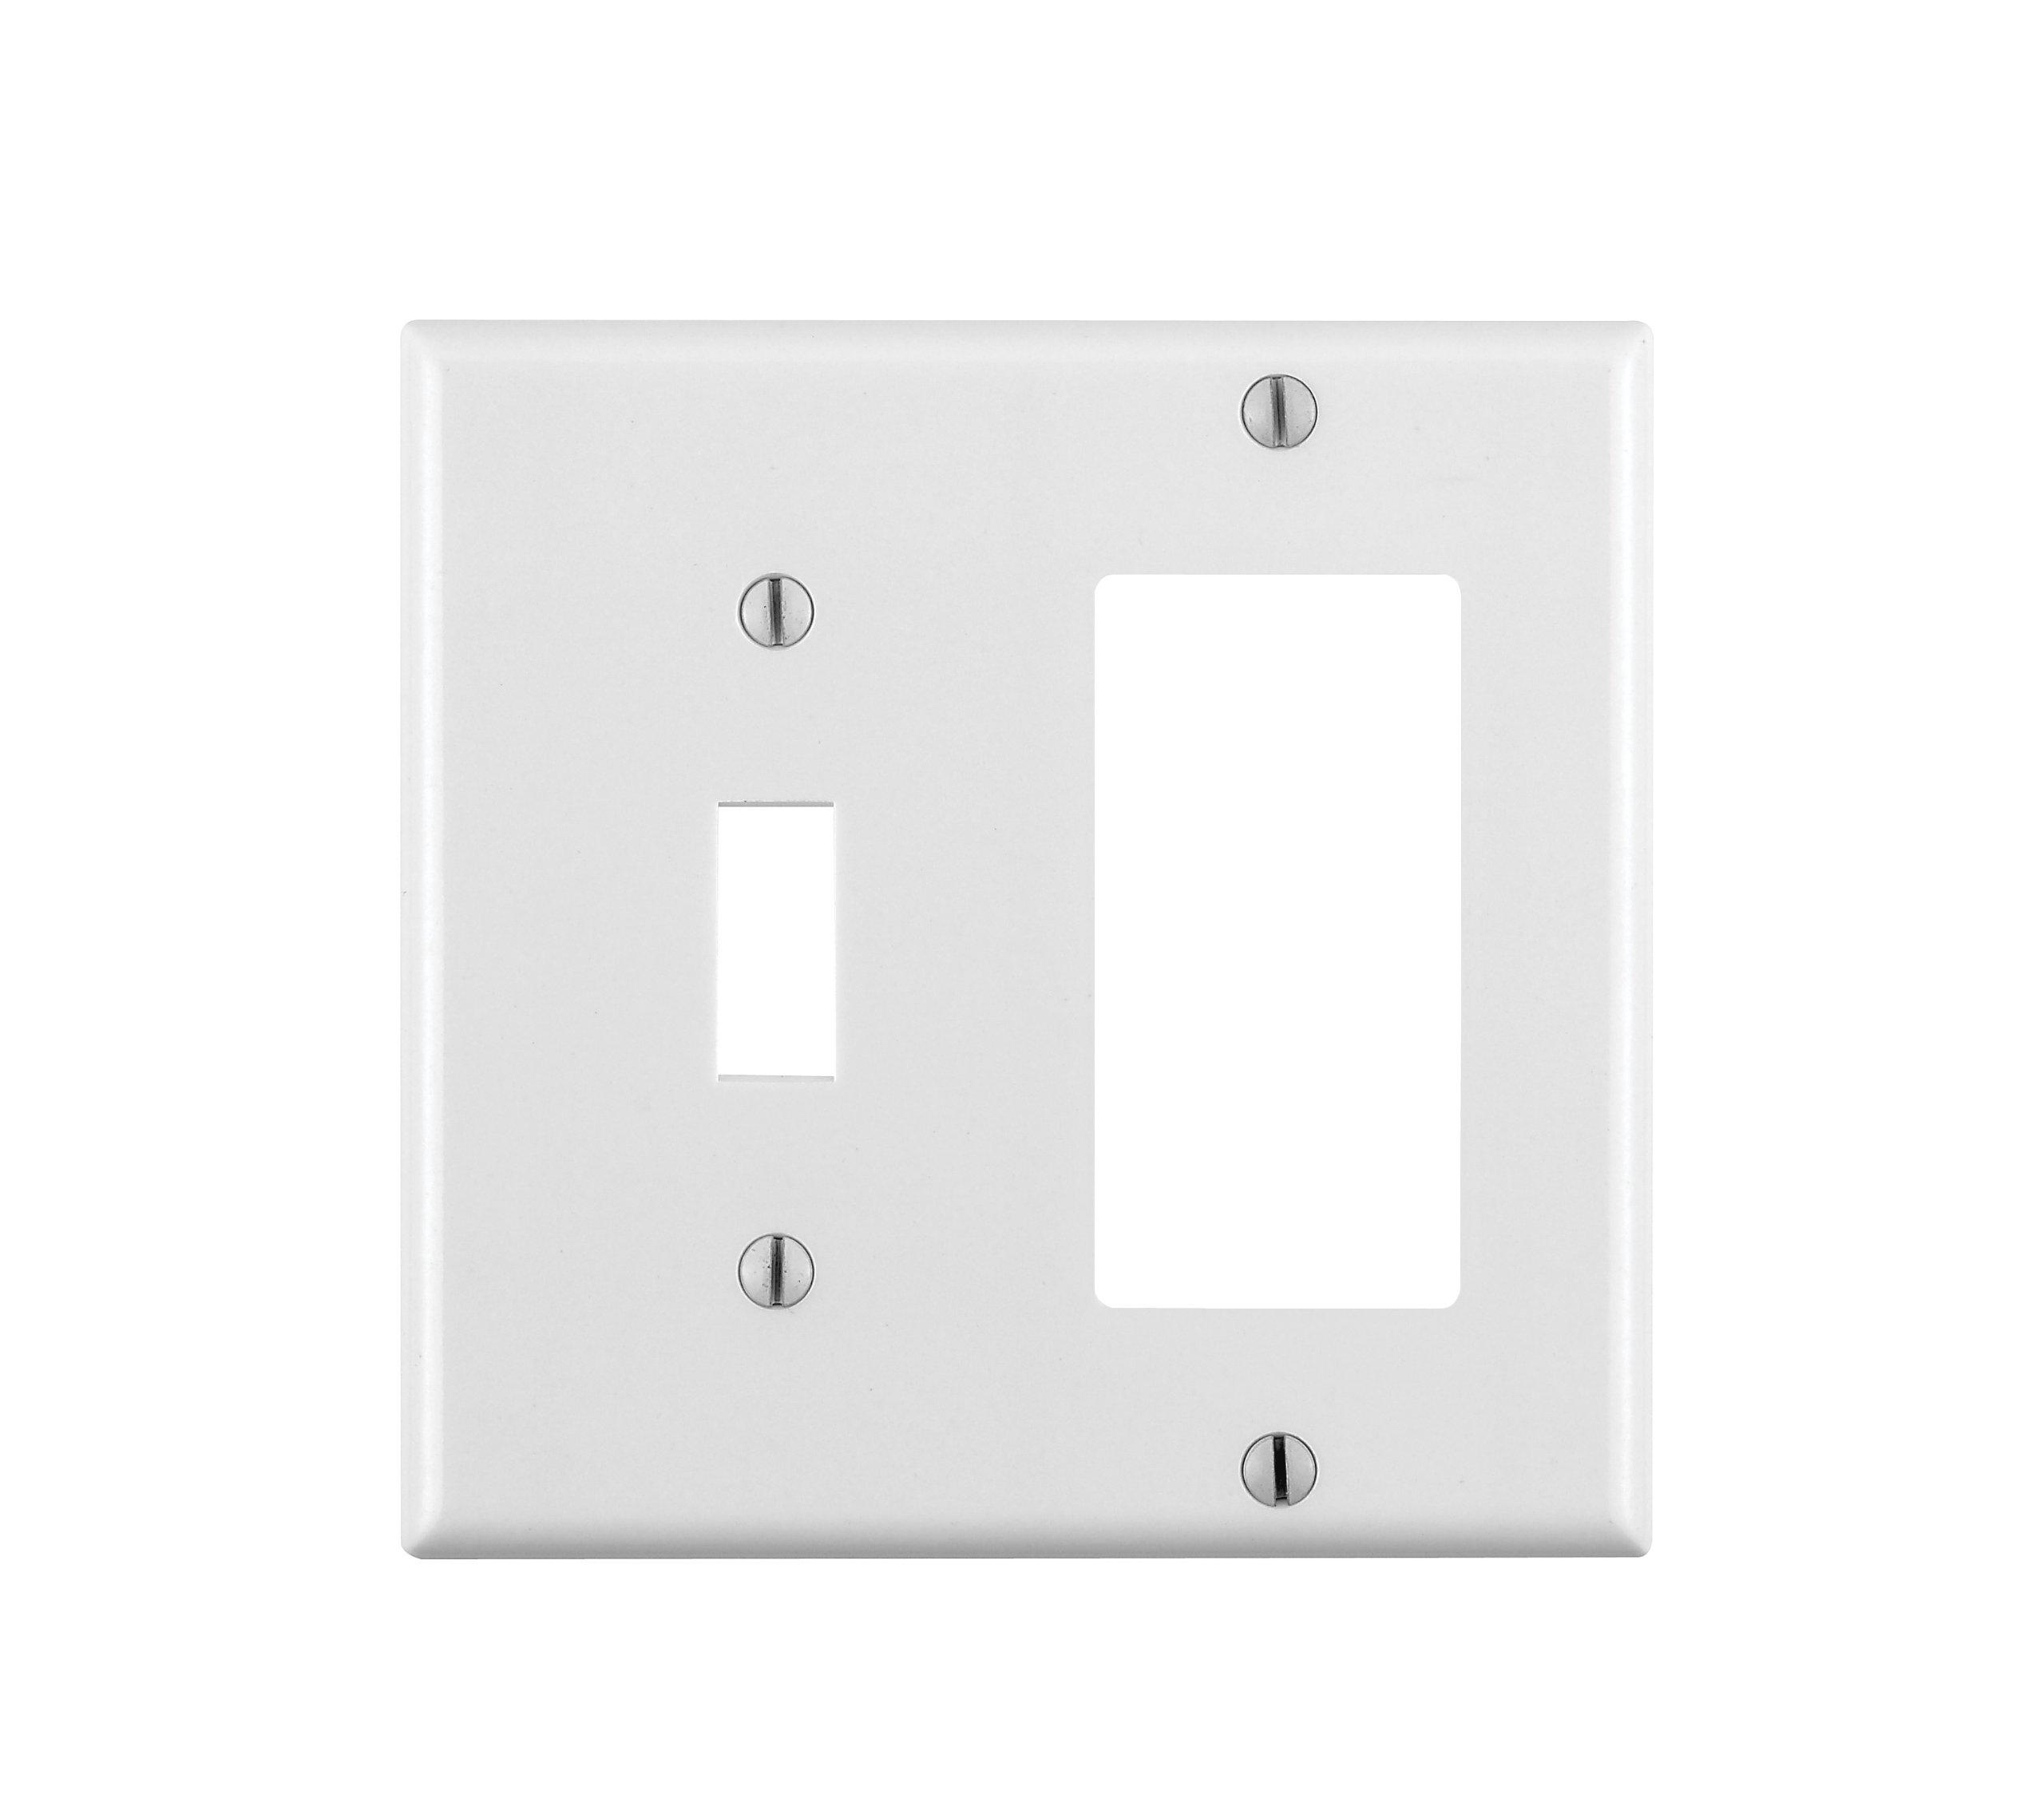 Leviton 80405-W 2-Gang 1-Toggle 1-Decora/GFCI Combination Wallplate, Standard Size, Thermoset, Device Mount, White, 1 Pack